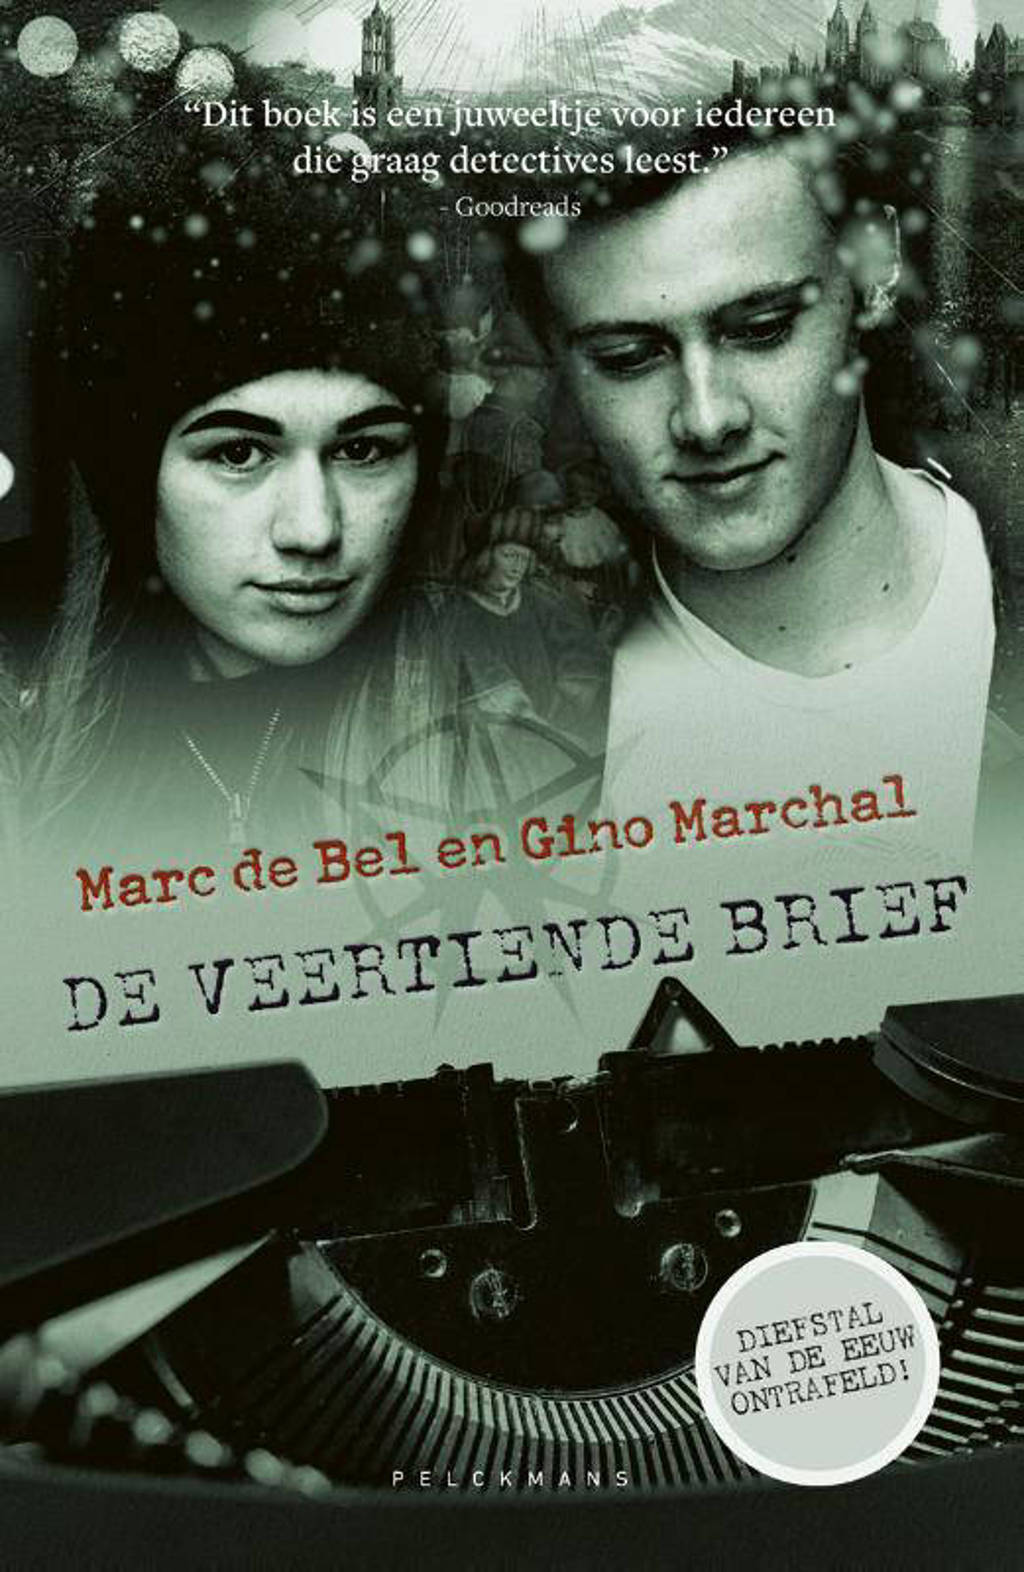 De veertiende brief - Marc de Bel en Gino Marchal